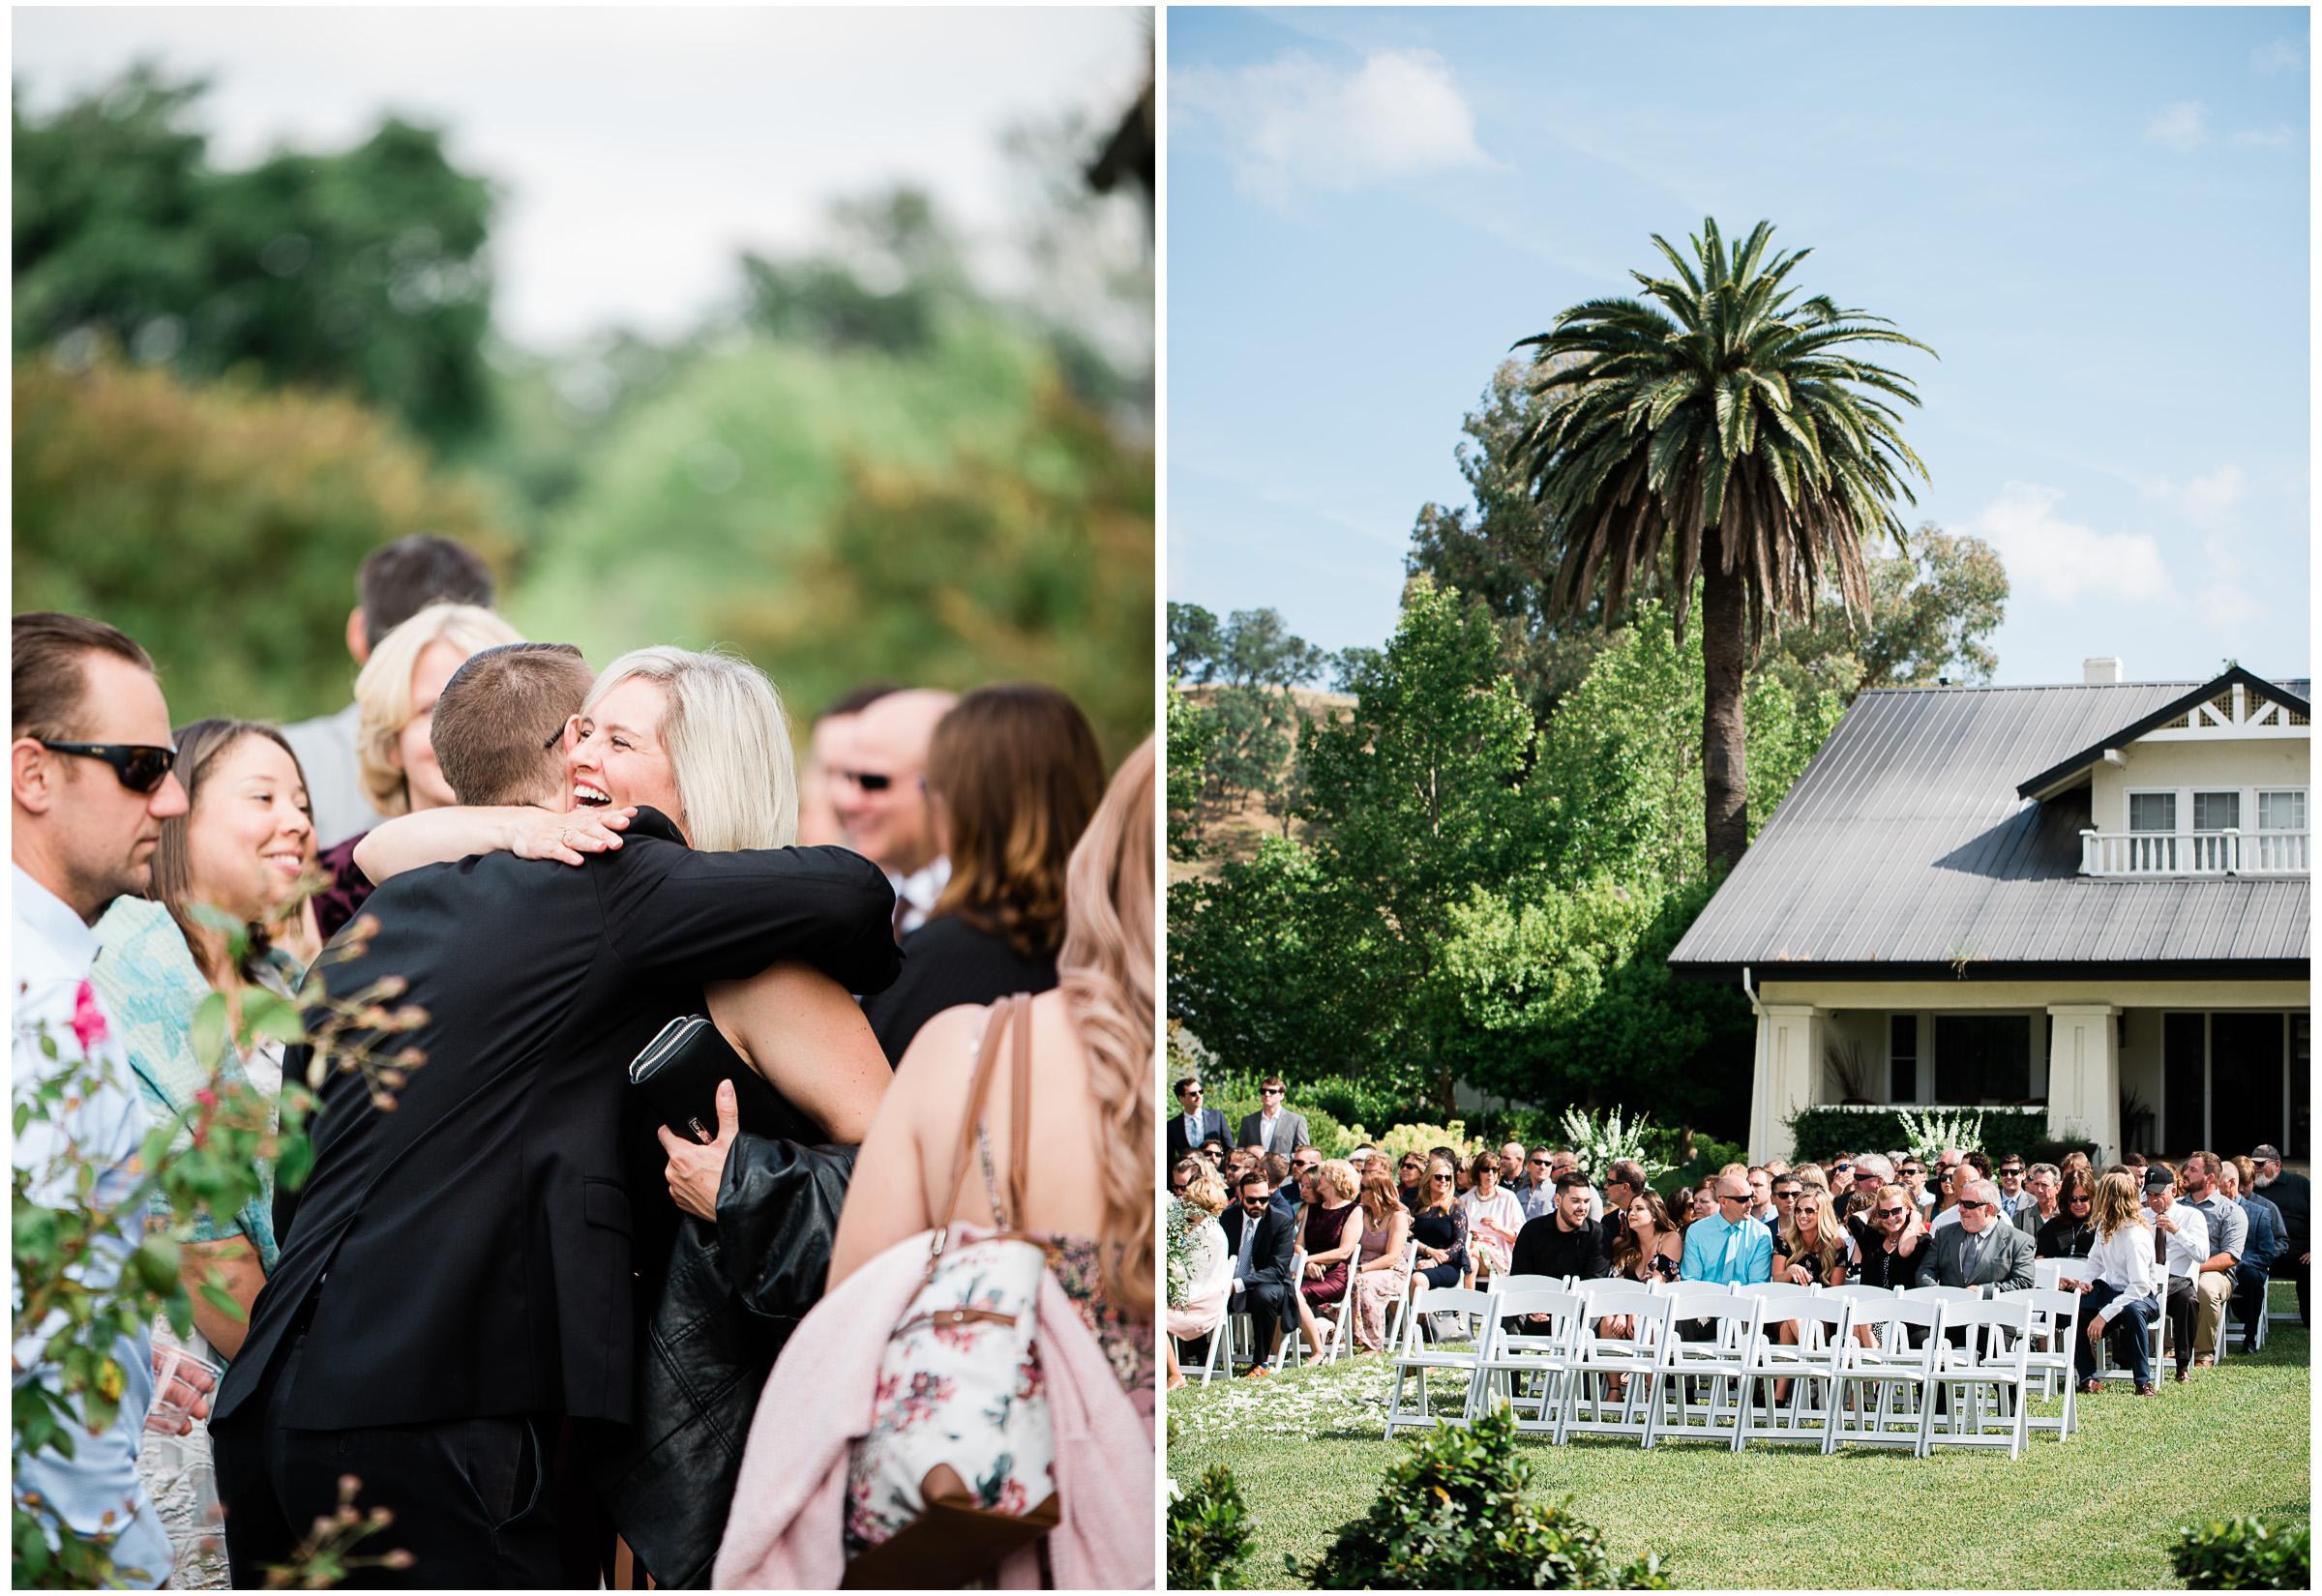 Winters Wedding - Sacramento Photographer - Field & Pond - Justin Wilcox Photography - 24.jpg